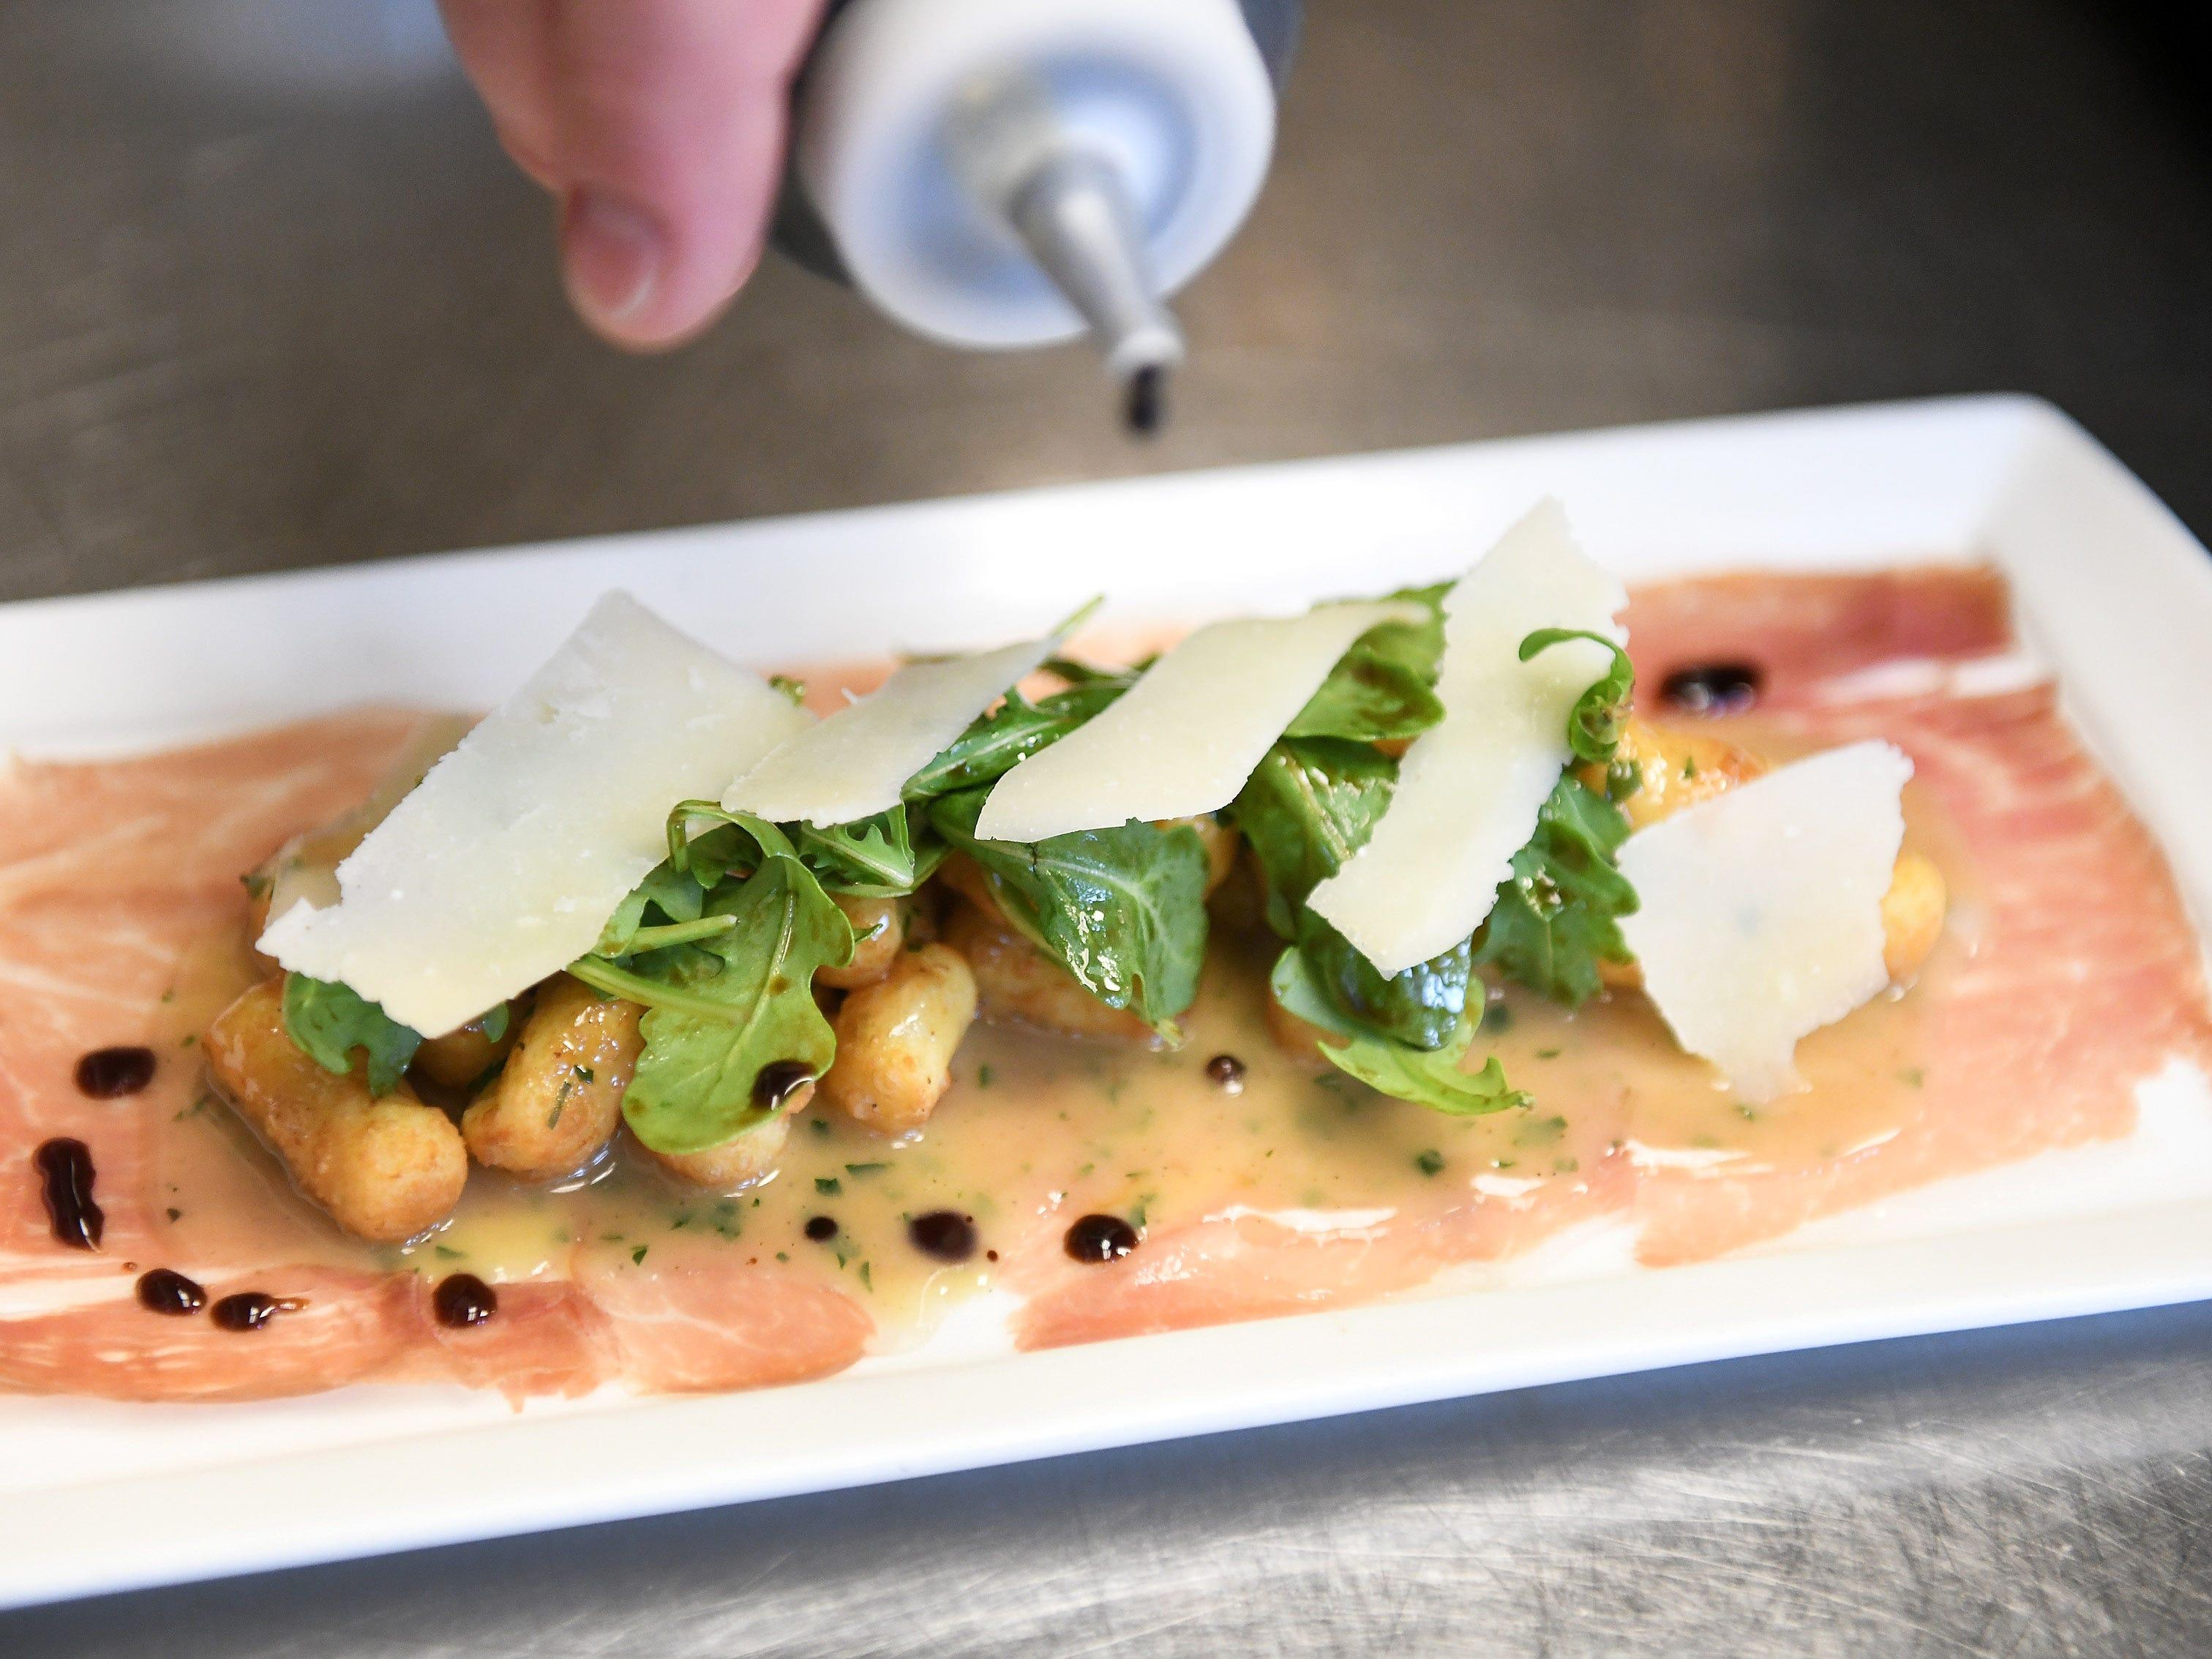 Parisian gnocchi with parma prosciutto, arugula, shaved Parmesan and saba.